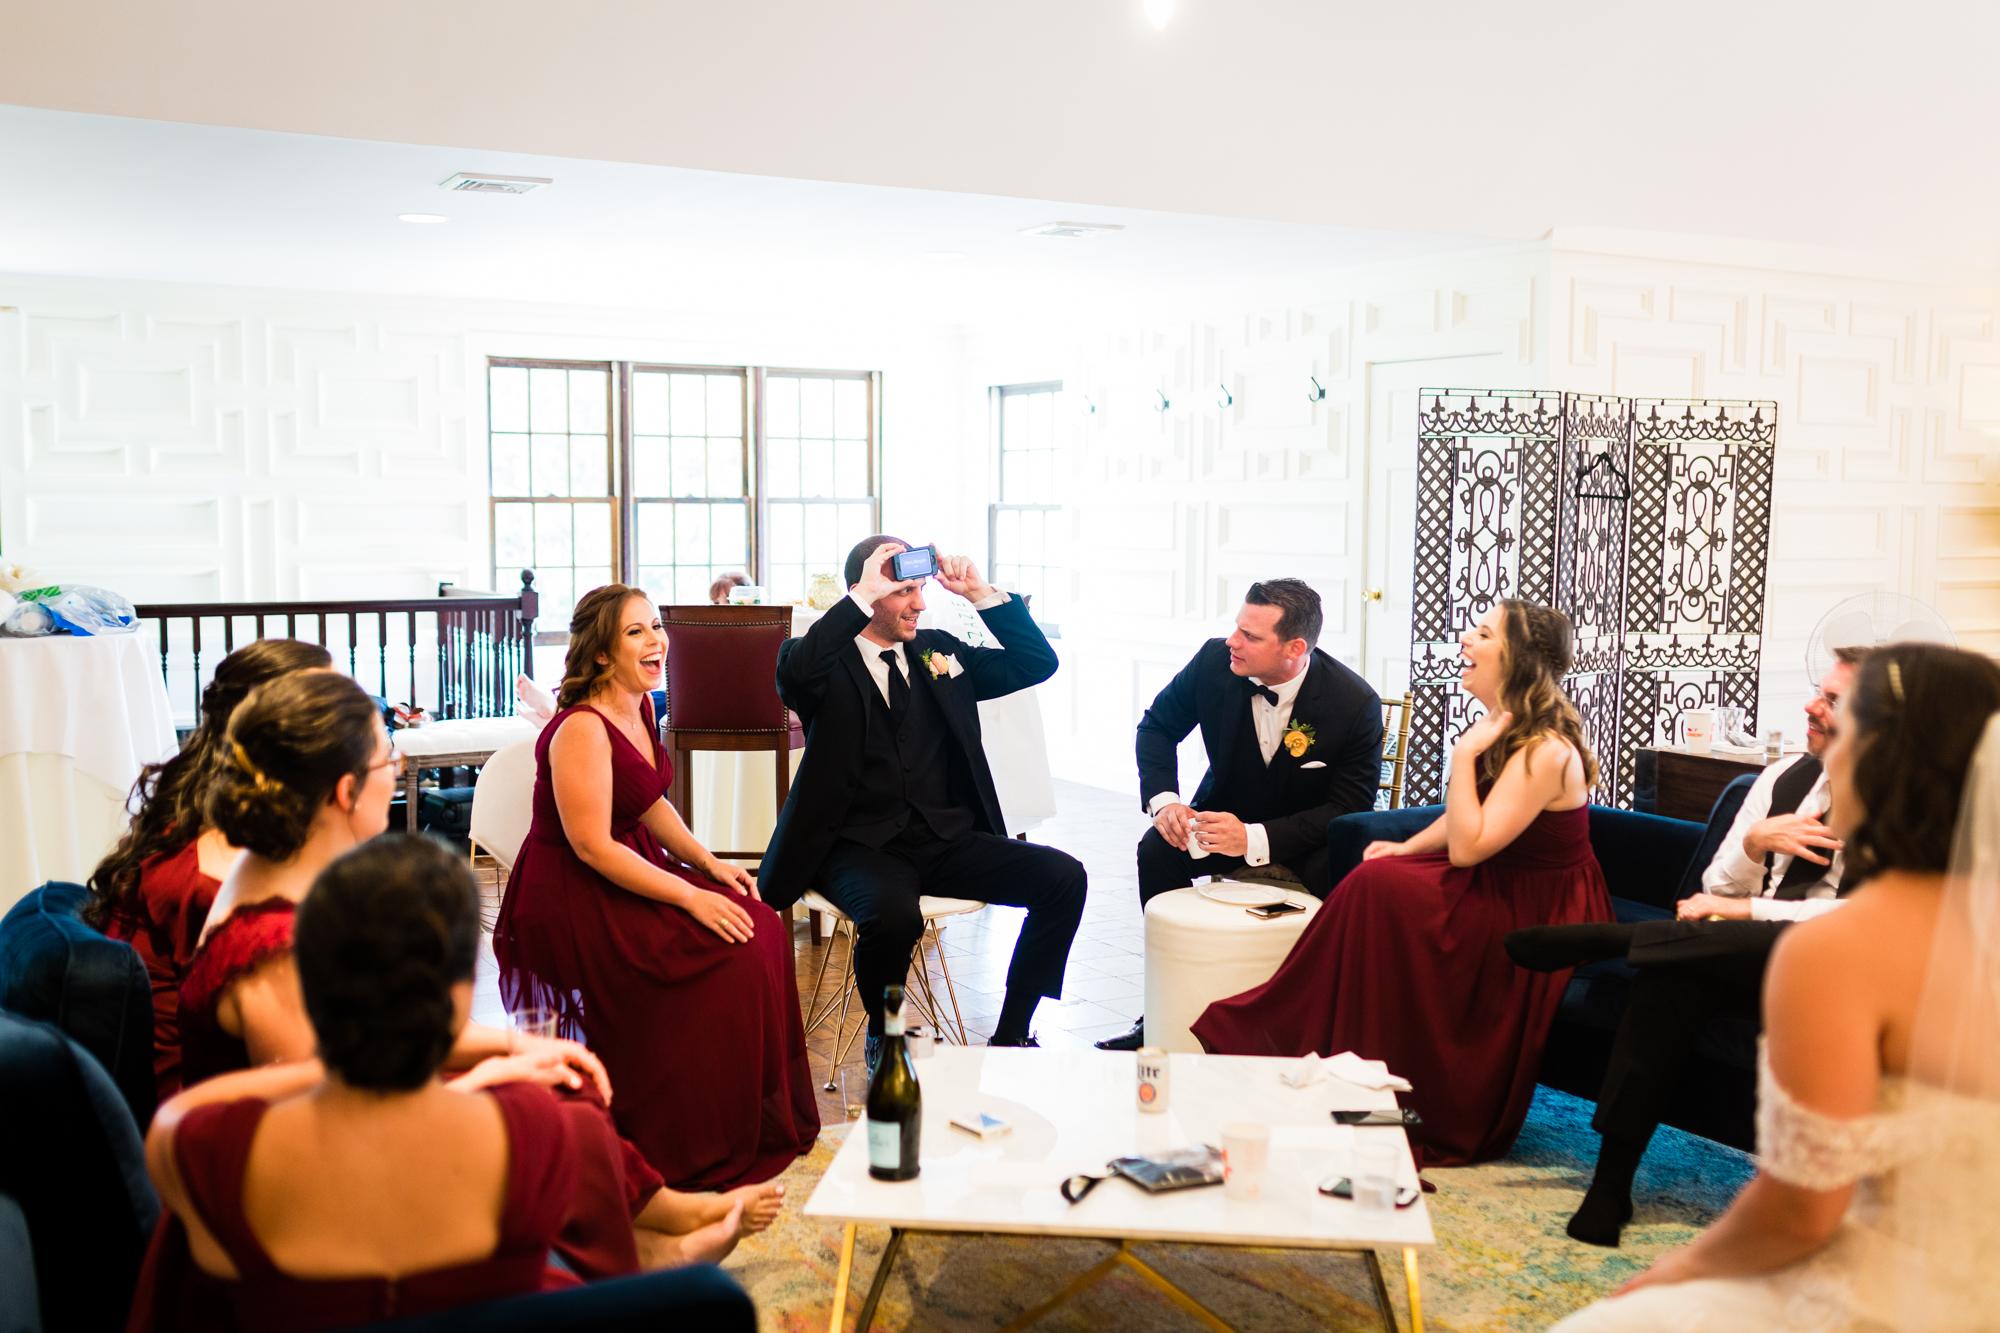 Hotel Du Village - LoveStruck Pictures - Wedding Photography-041.jpg